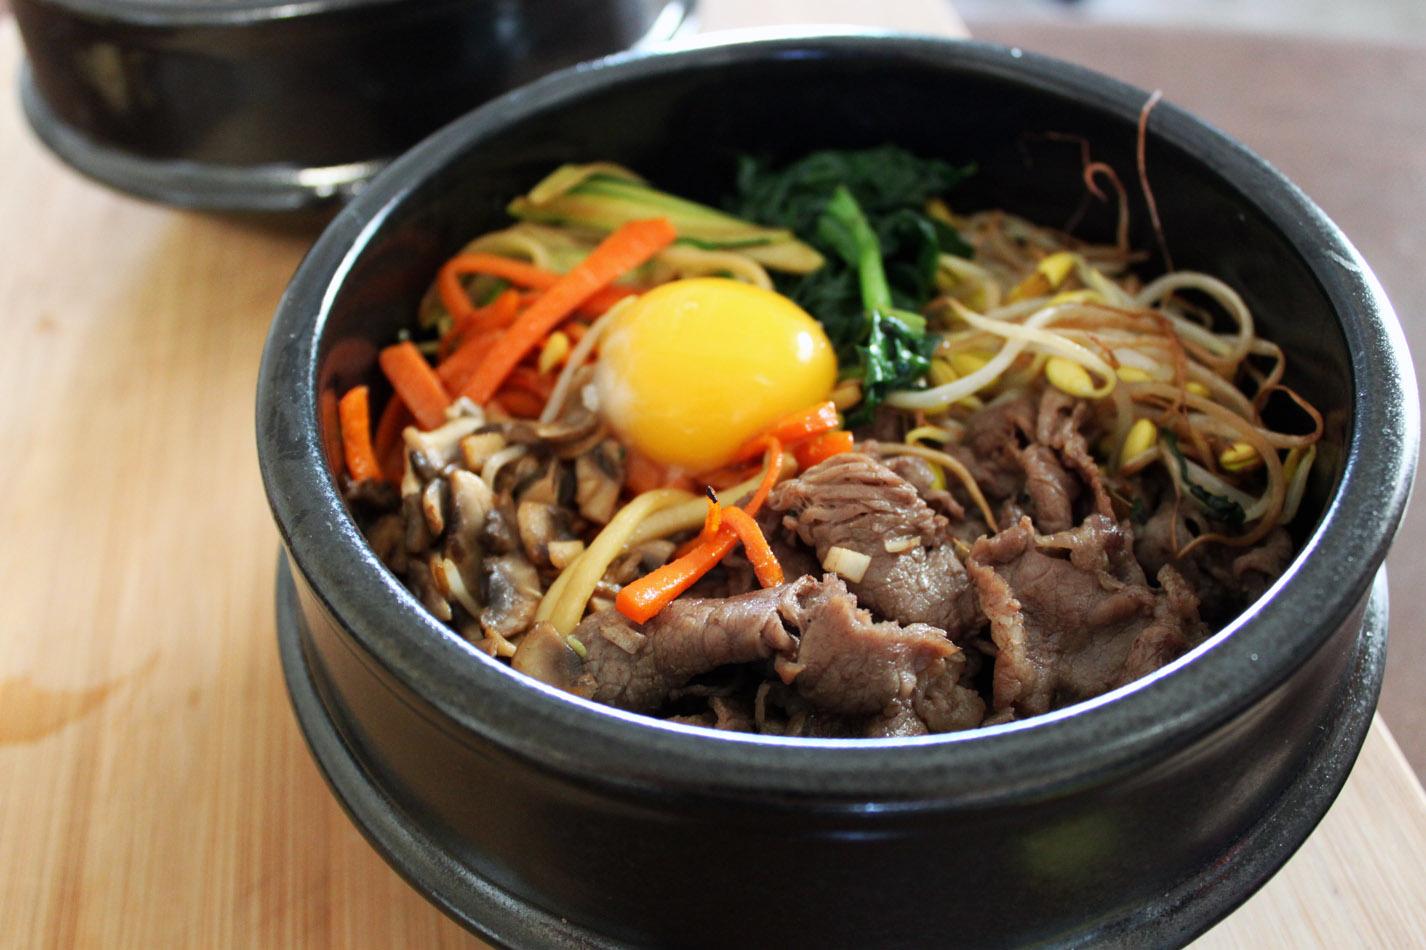 Koreans Food based Vegetable or Seafood [Part 2]